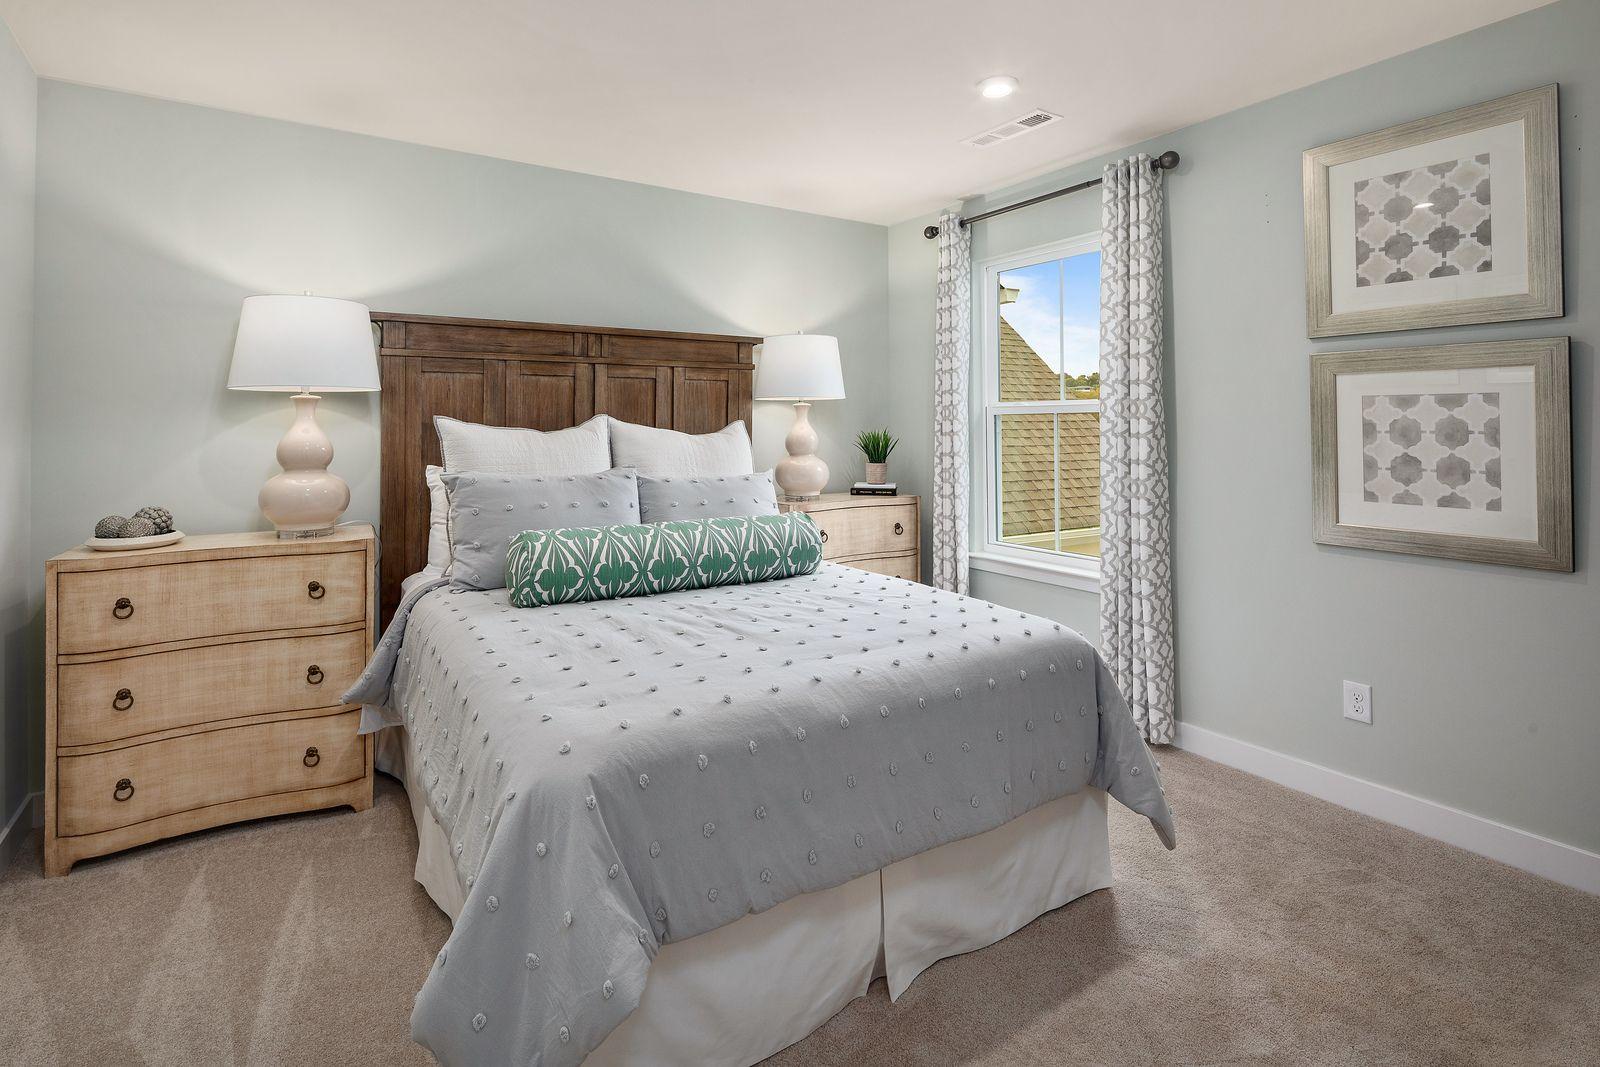 Bedroom featured in the Calvert By Ryan Homes in Cincinnati, OH